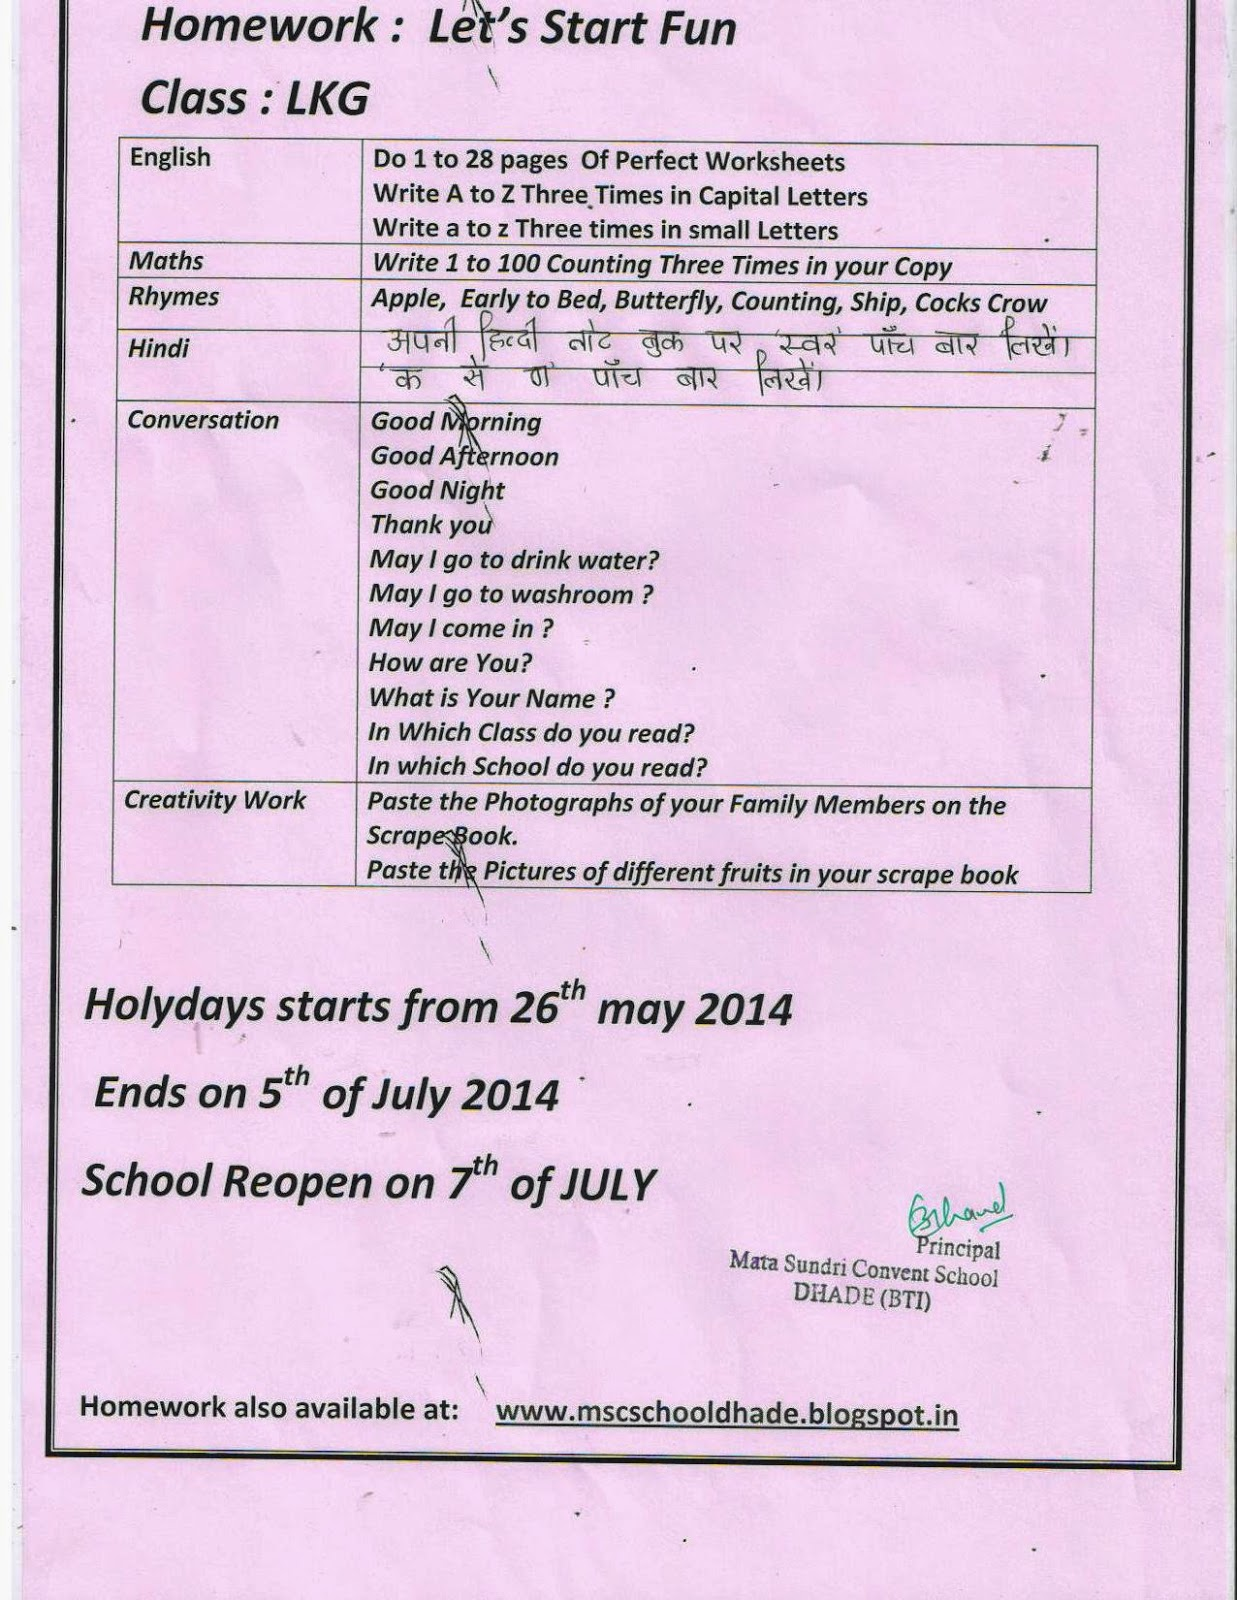 Mata Sundri Convent School Holiday S Homework For Lkg Class